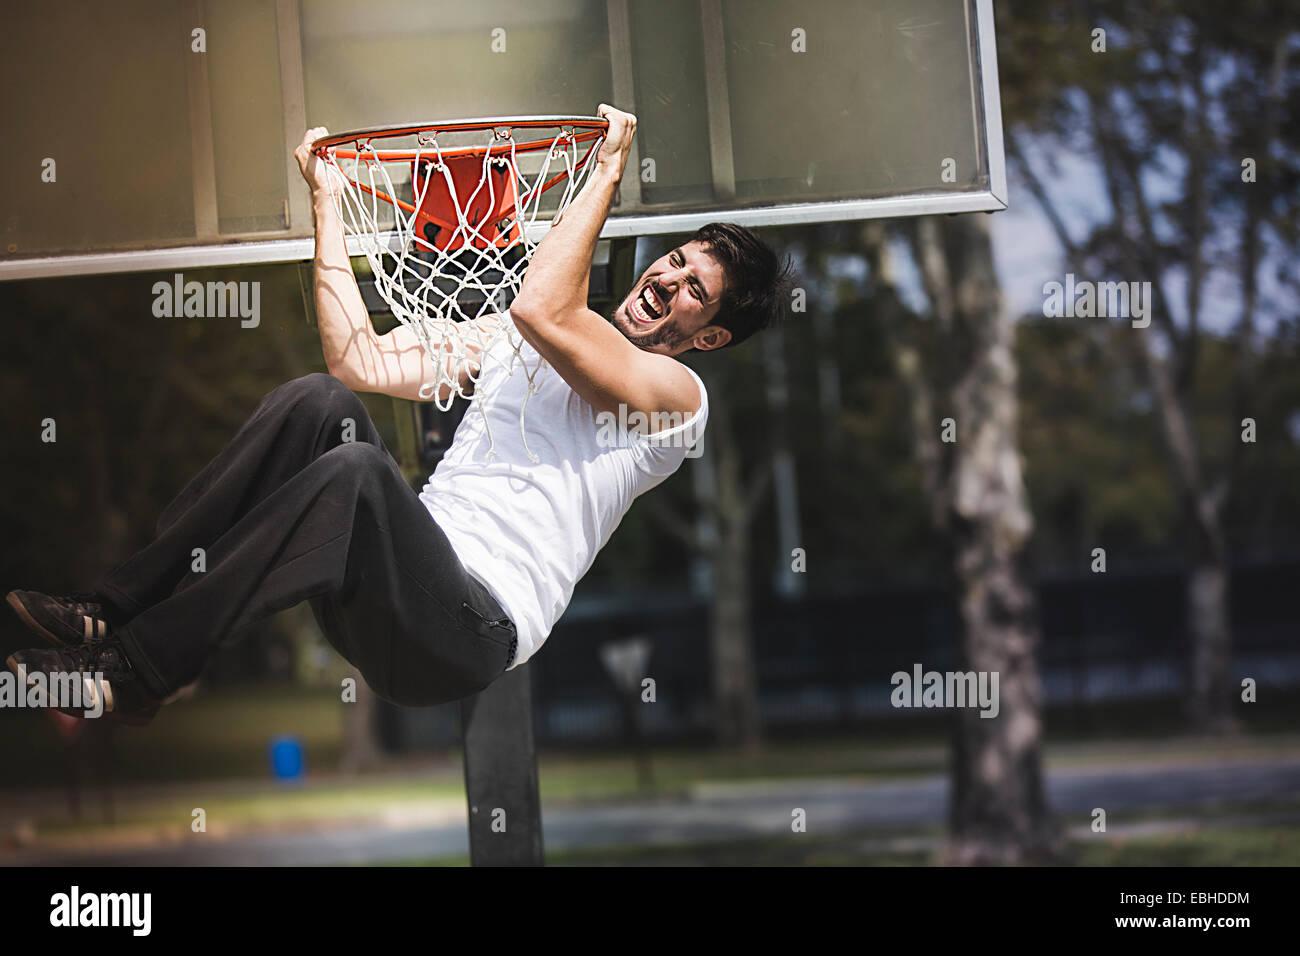 Junge männliche Basketball hängend Basketballkorb Stockbild